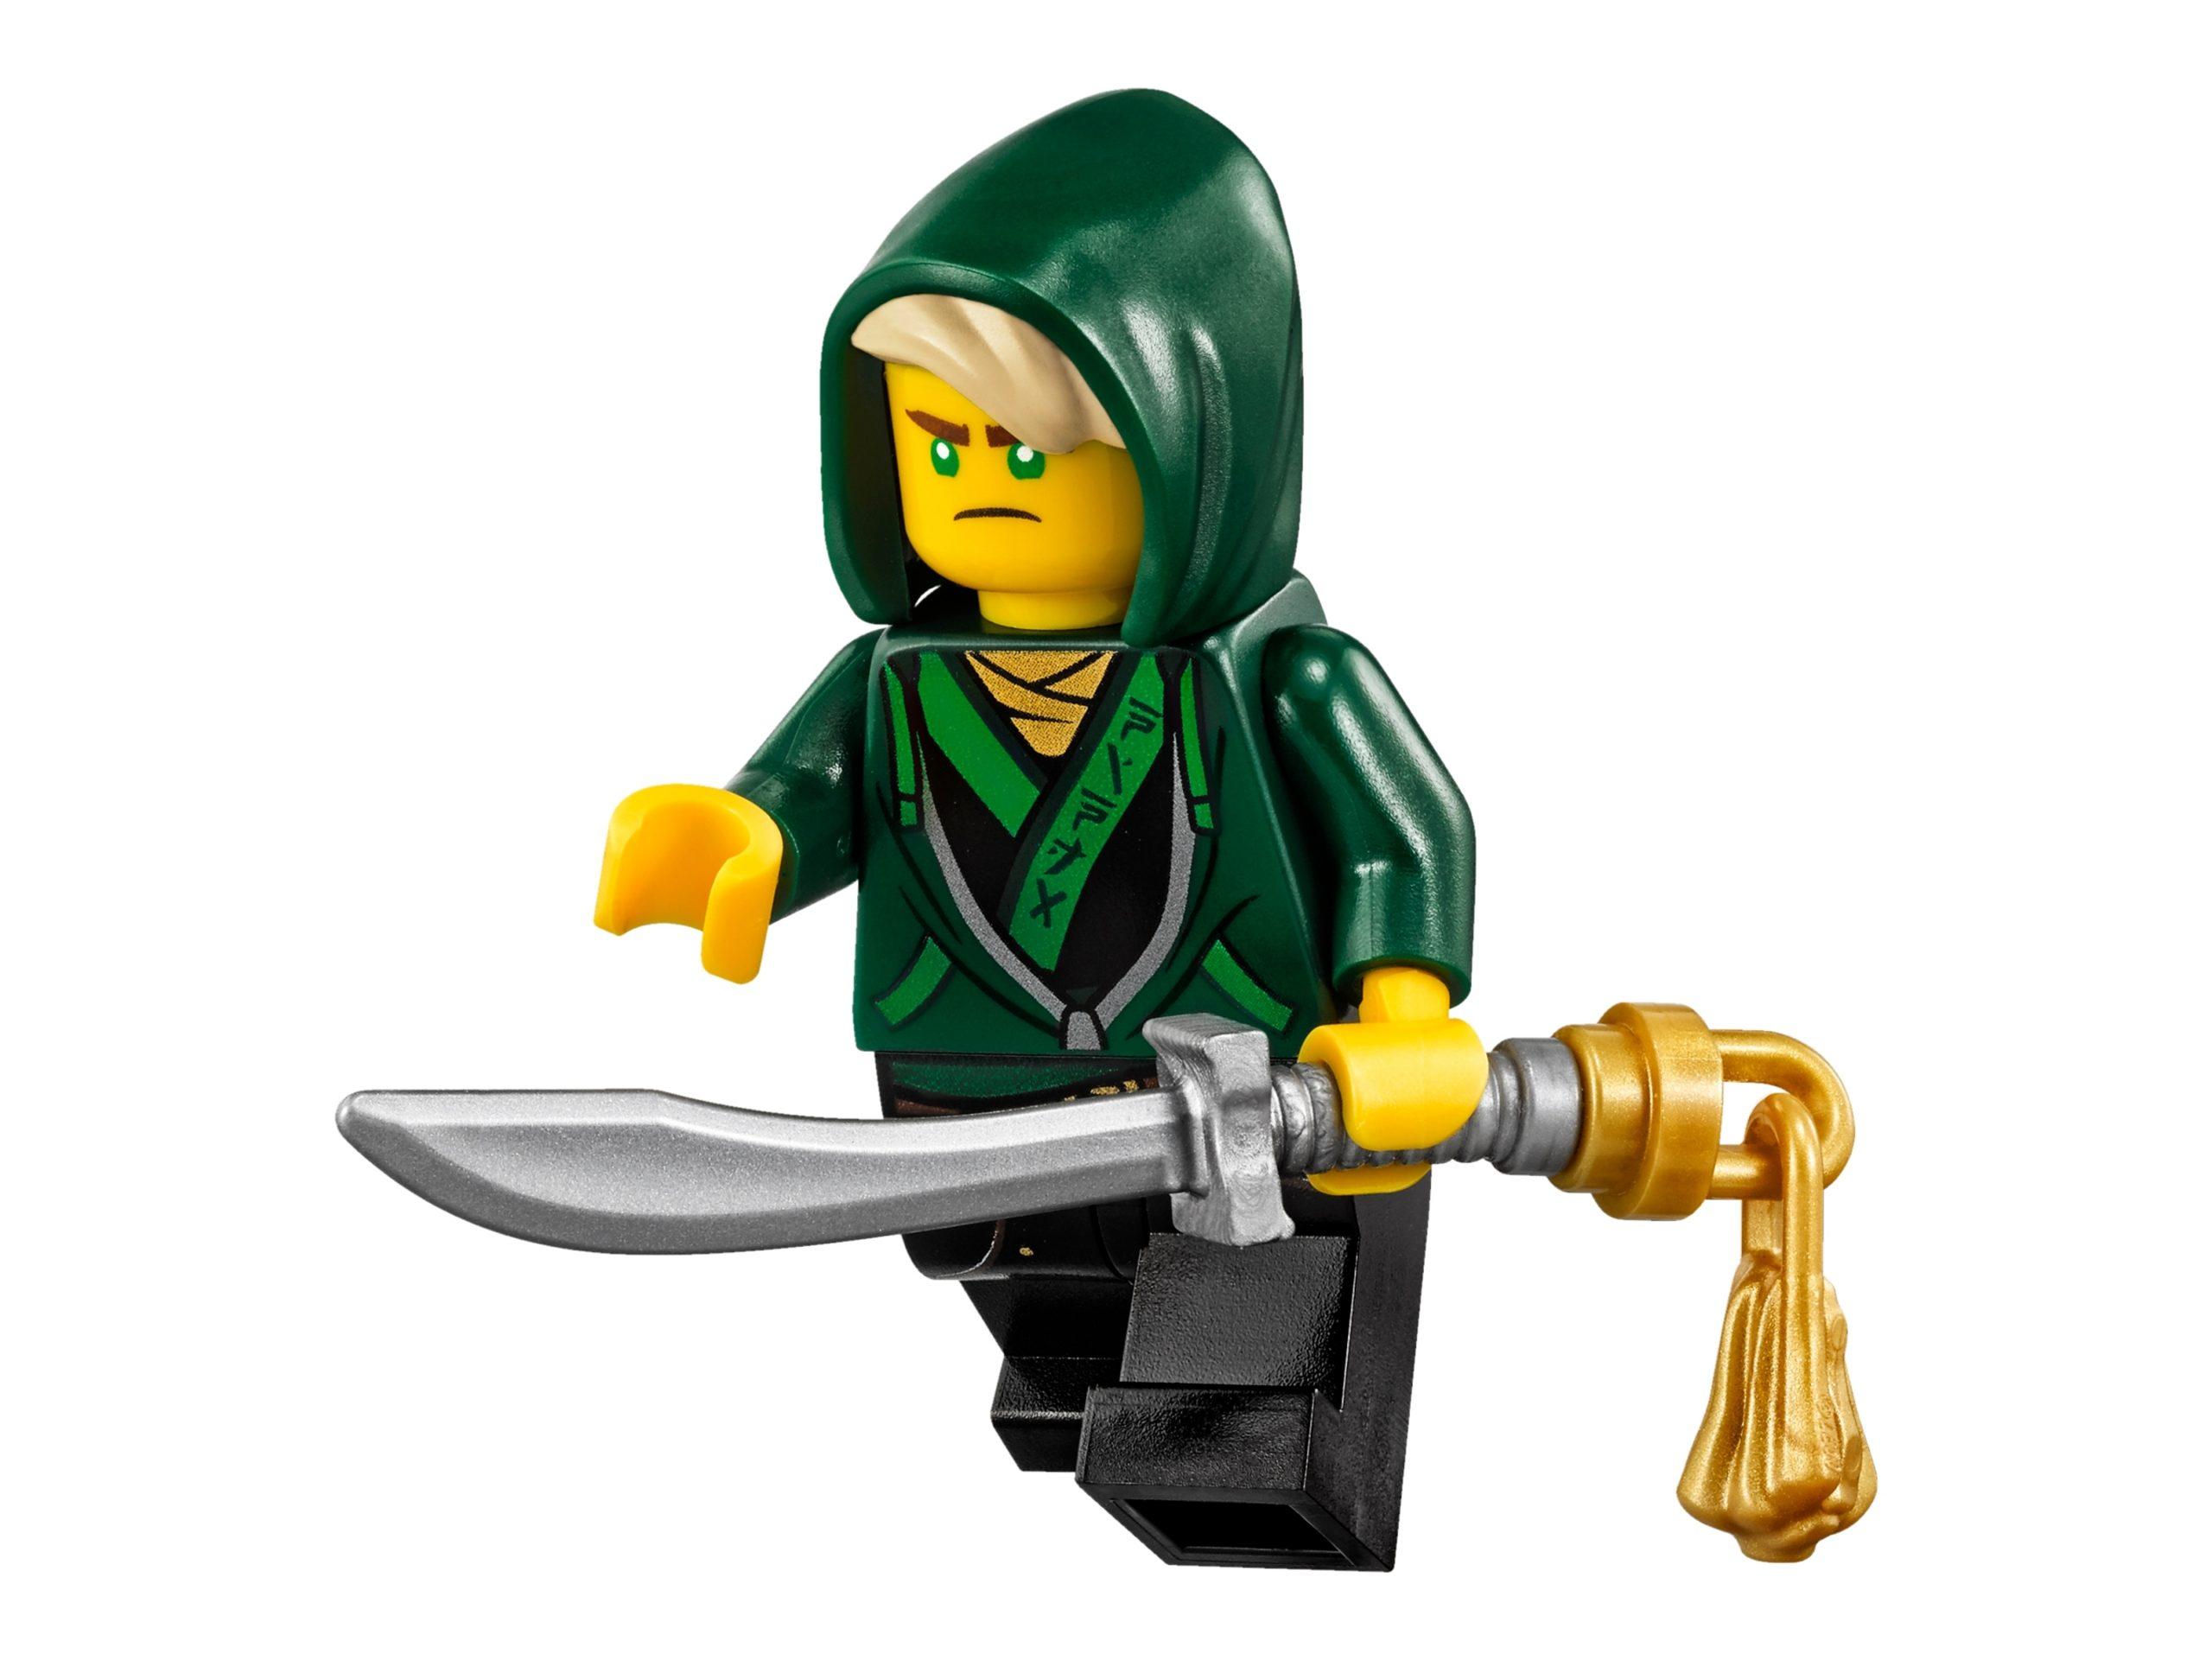 la figurine lloyd lego 30609 ninjago scaled